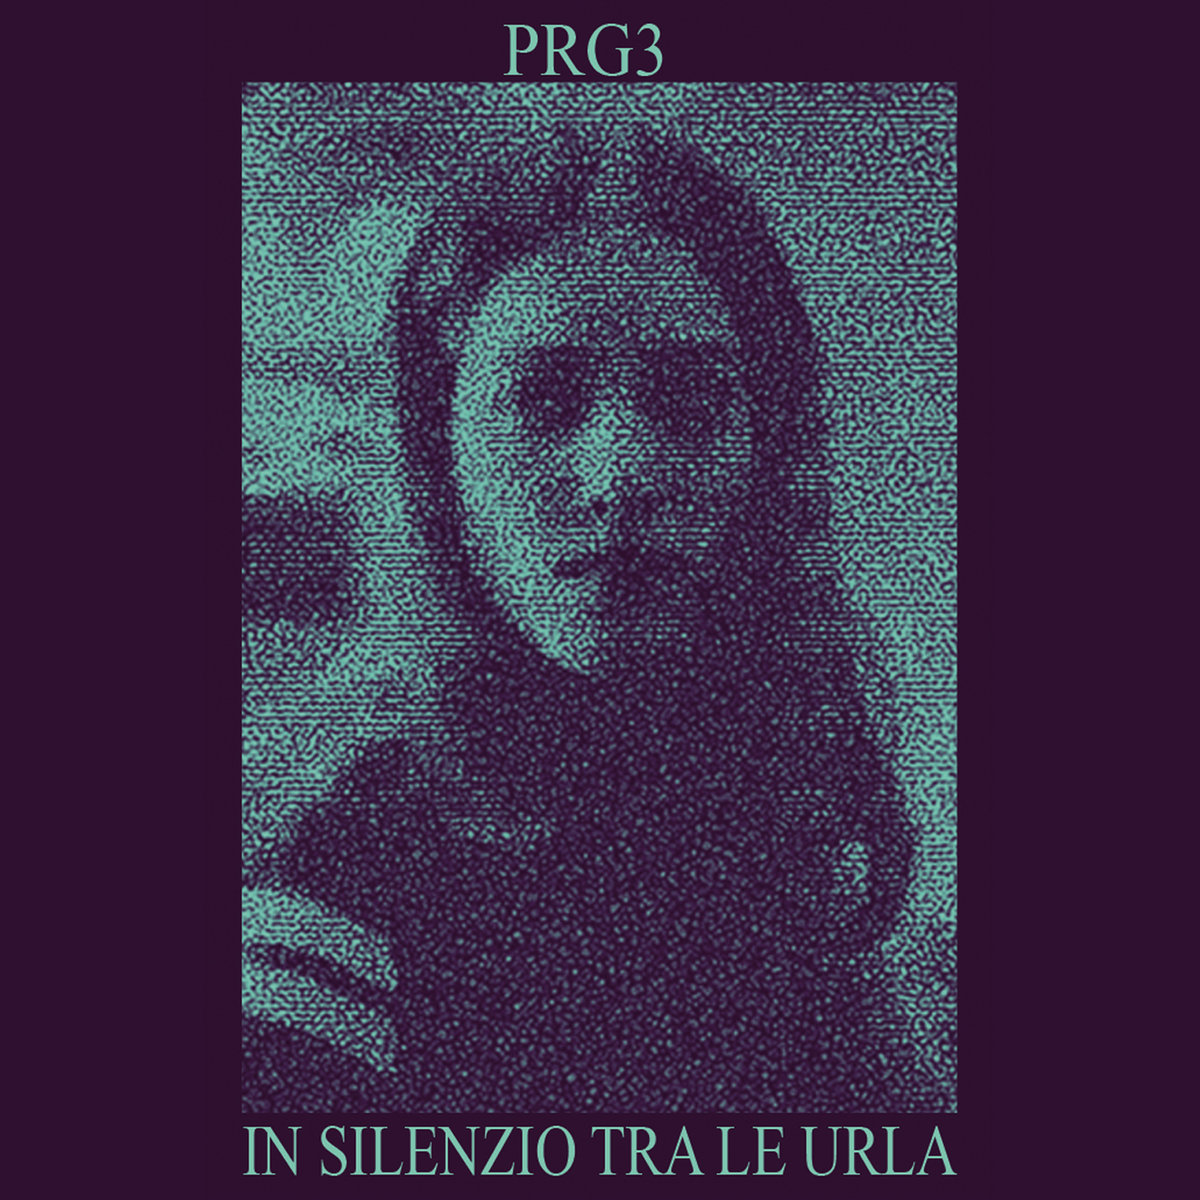 PRG3 – In silenzio tra le urla